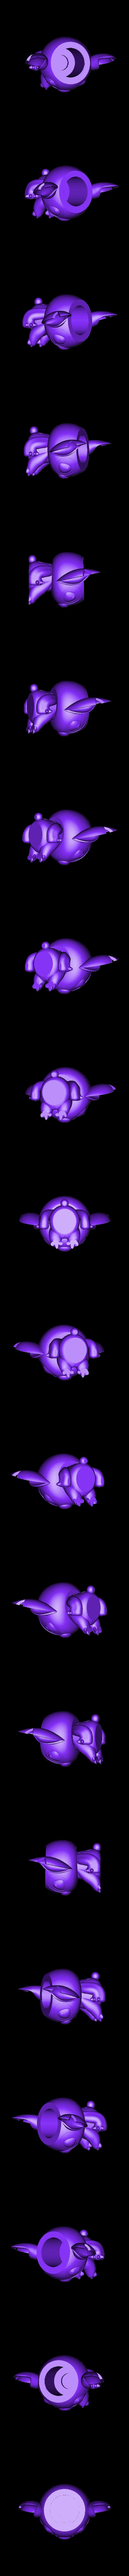 Stitch con cuerpo mate.stl Télécharger fichier STL gratuit mate stich con cuerpo • Modèle pour impression 3D, IMPRESION3DCORDOBAA